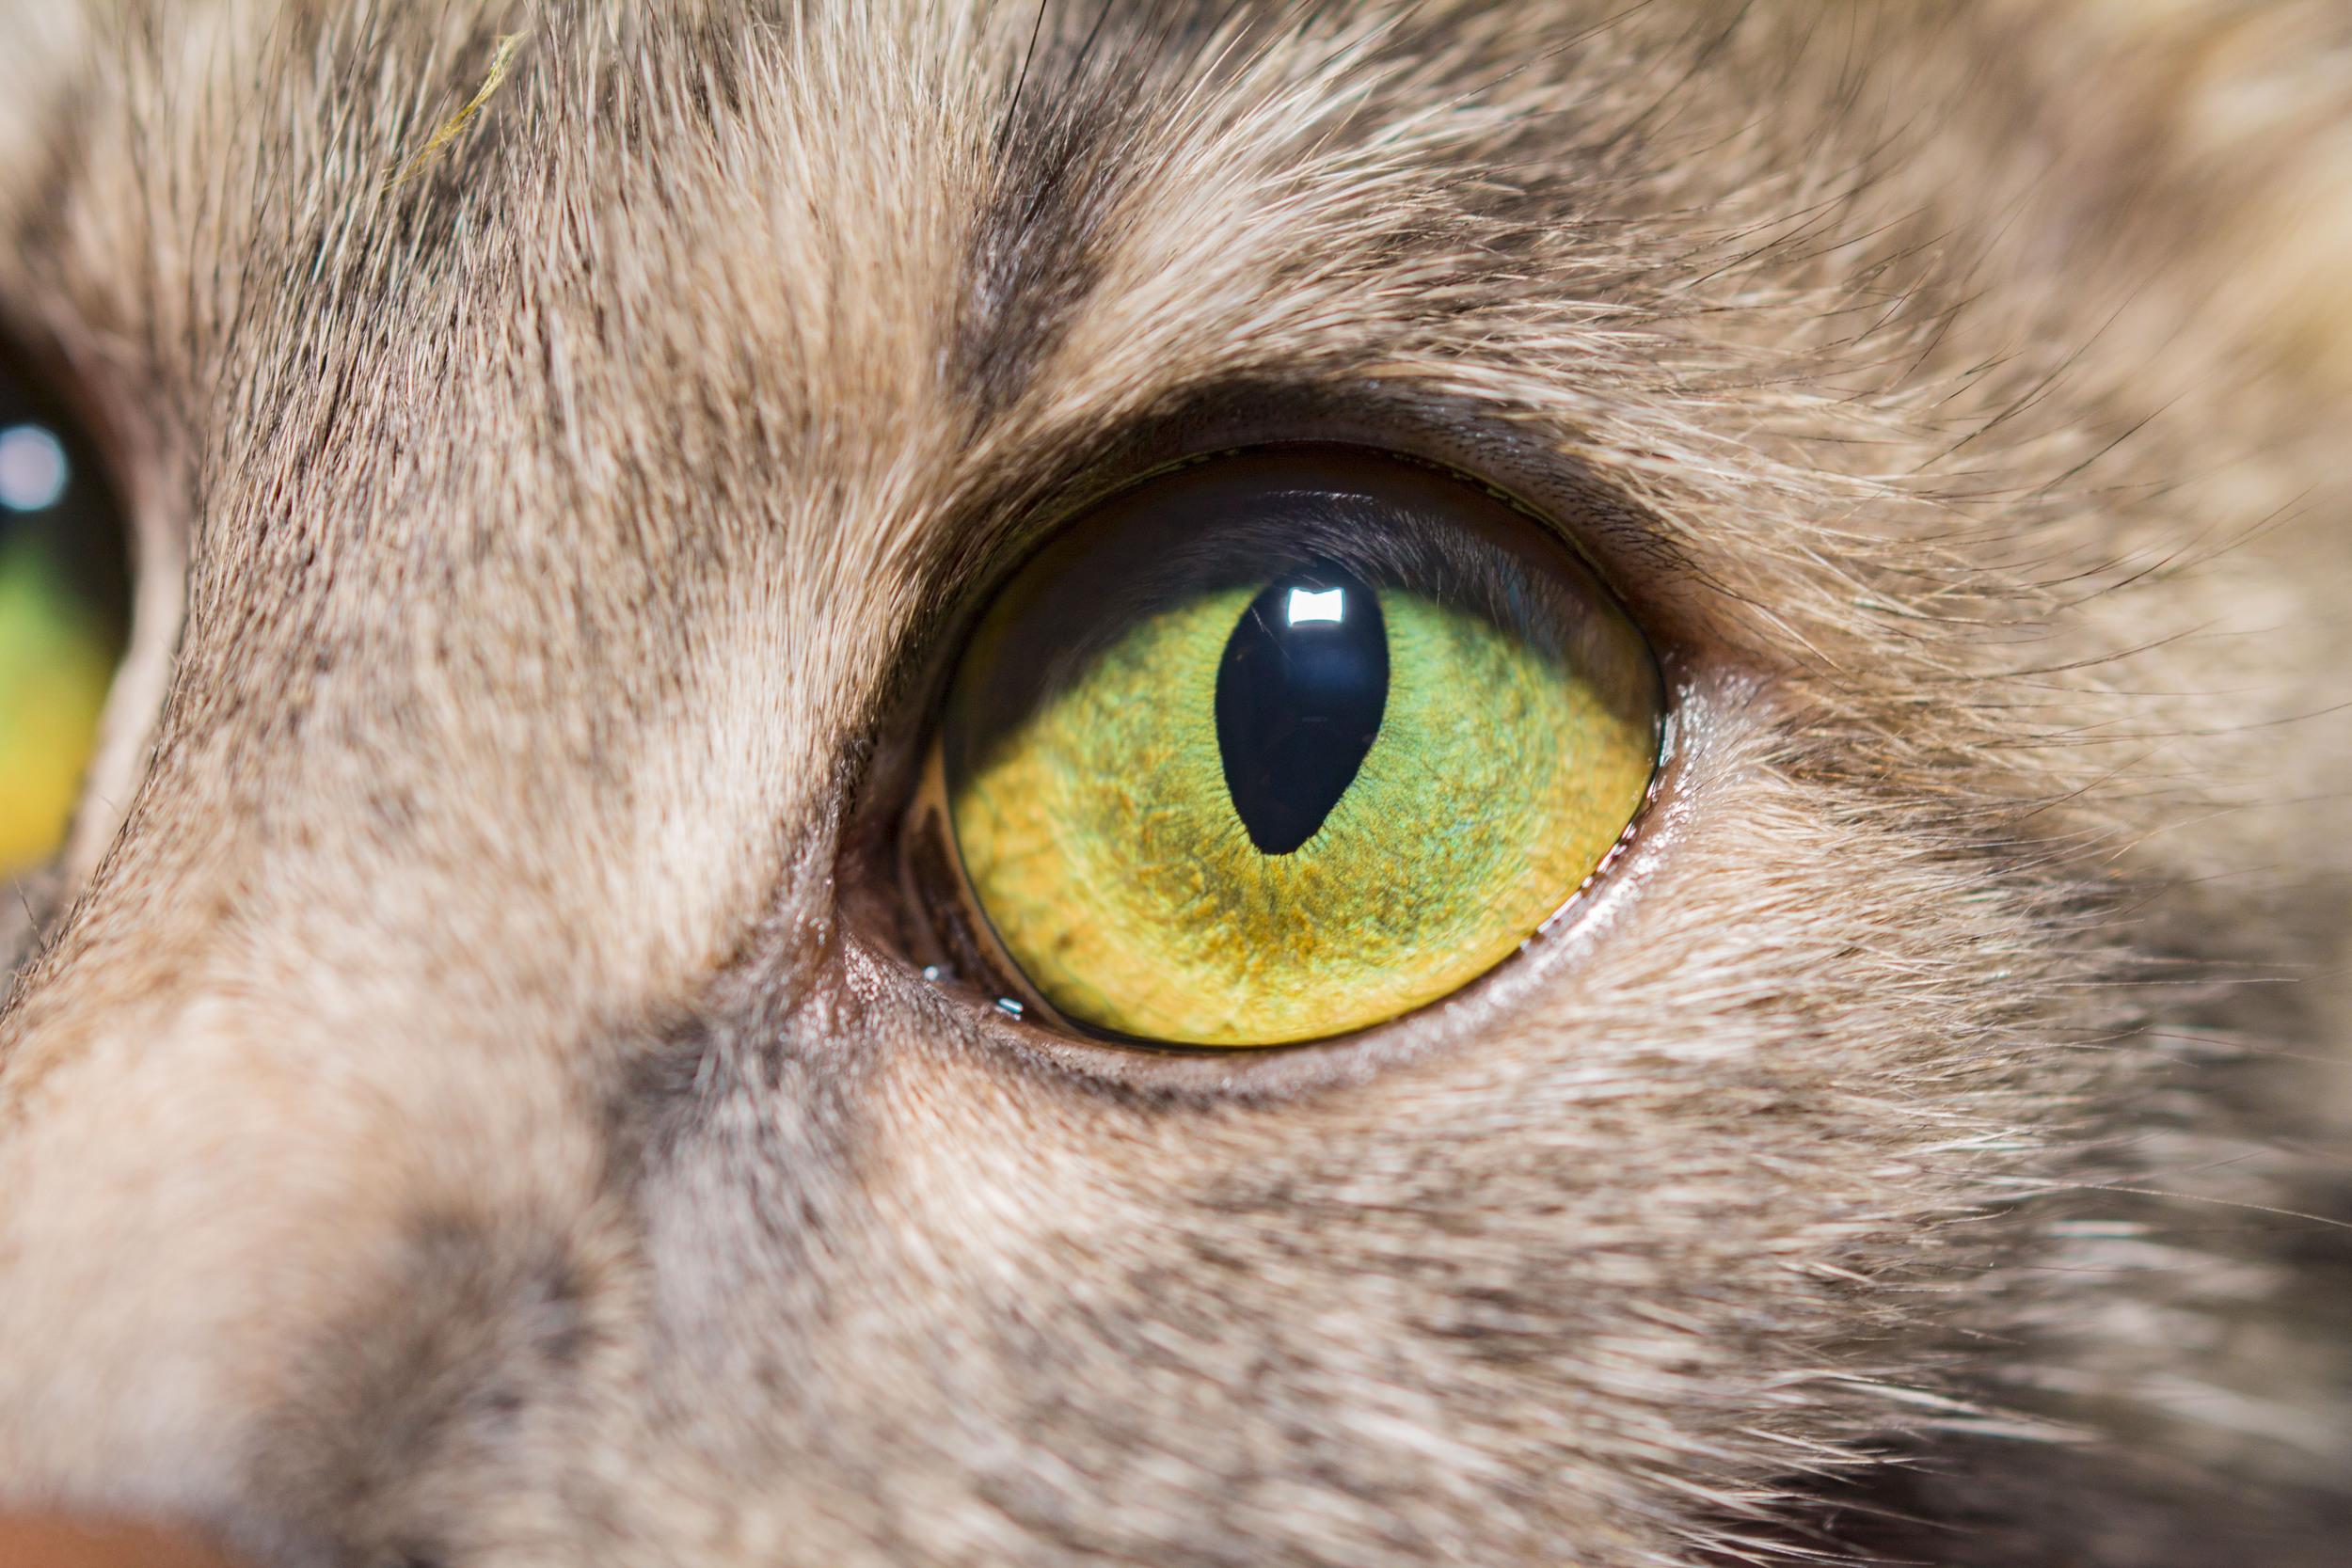 shutterstock cat green eye_457025764.jpg